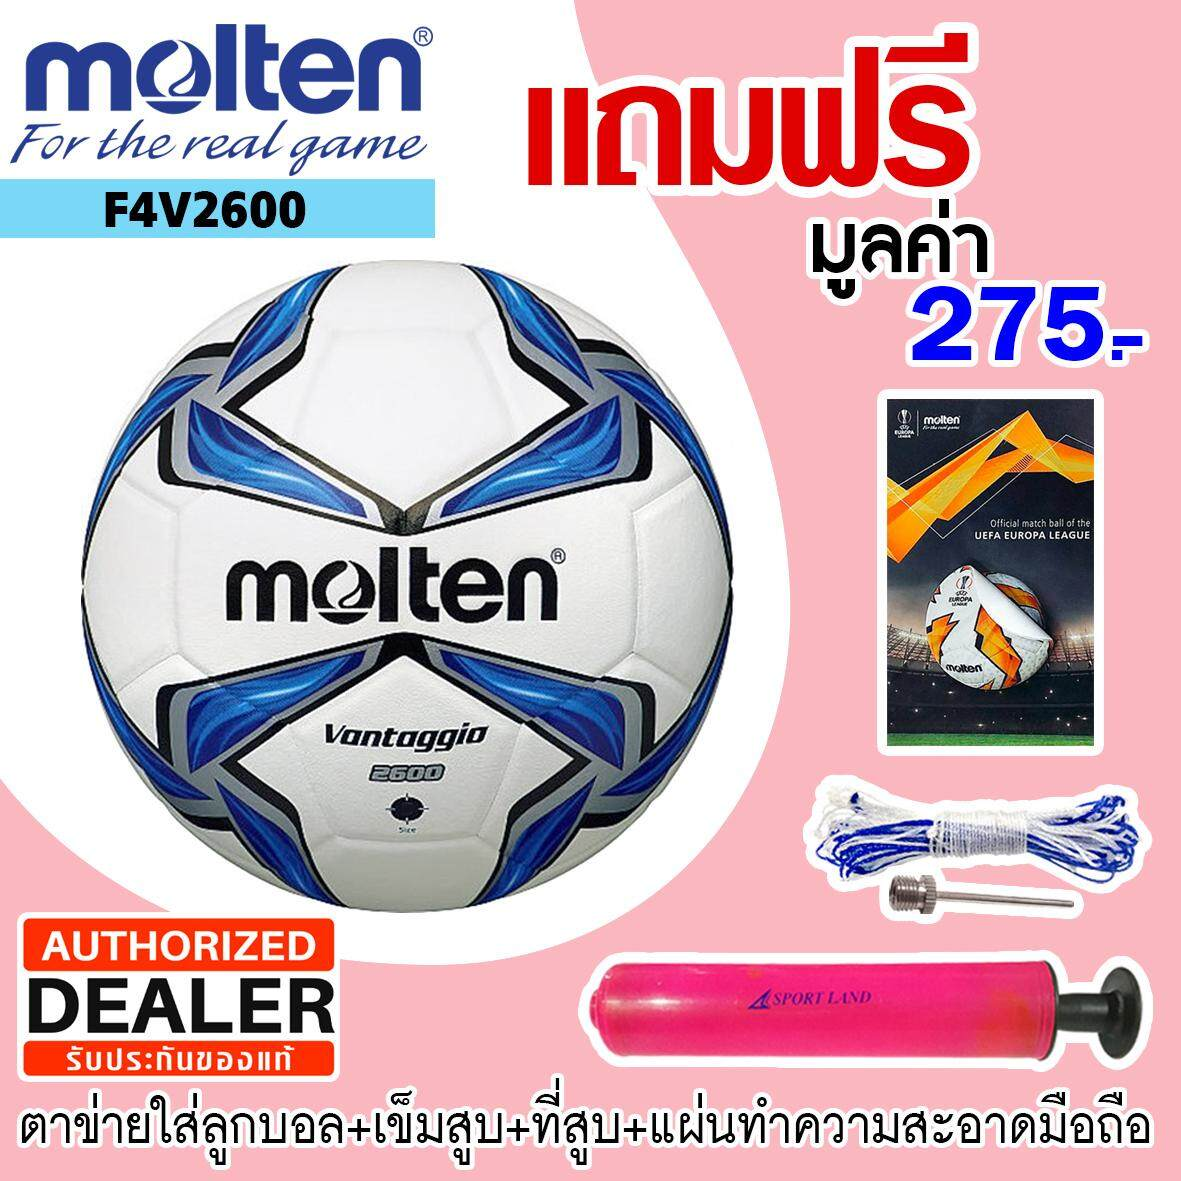 MOLTEN Football ลูกฟุตบอลหนังอัด หนัง PU molten F4V2600 เบอร์4 (750)  แถมฟรี ตาข่ายใส่ลูกฟุตบอล + เข็มสูบลม + สูบมือ SPL รุ่น SL6 สีชมพู + แผ่นทำความสะอาดมือถือ